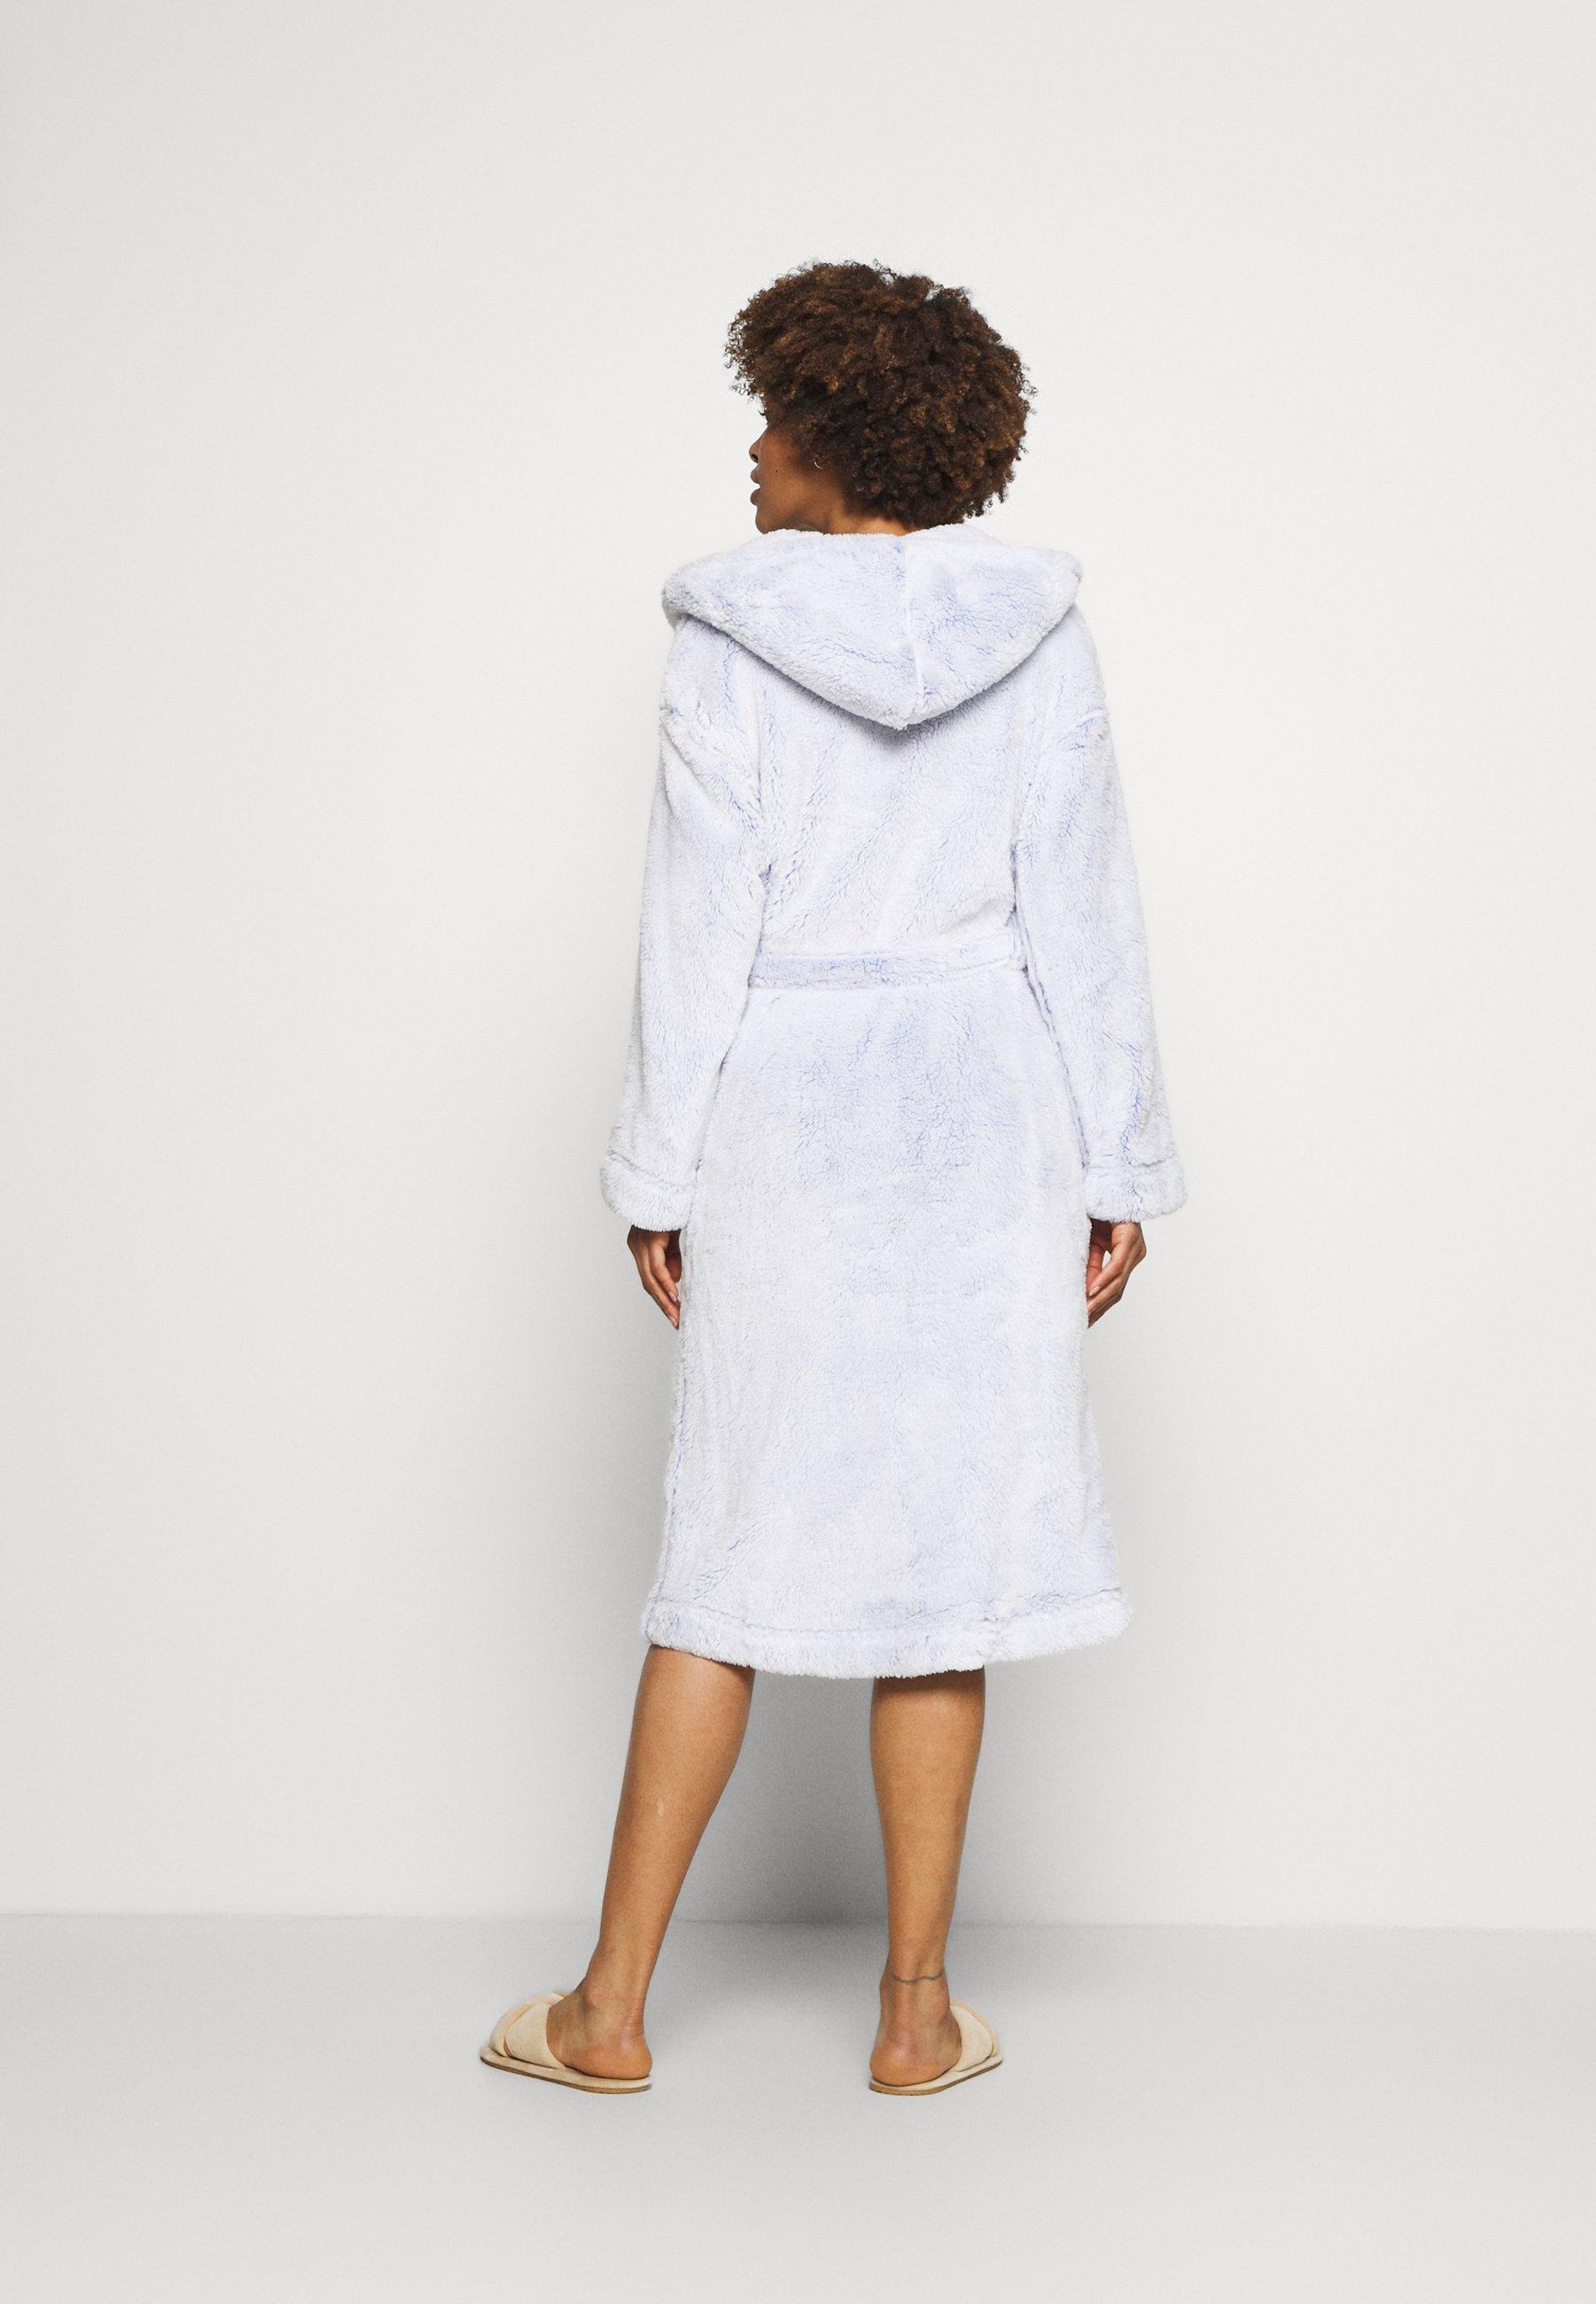 Damen DRESSING GOWN COVER UPS - Bademantel